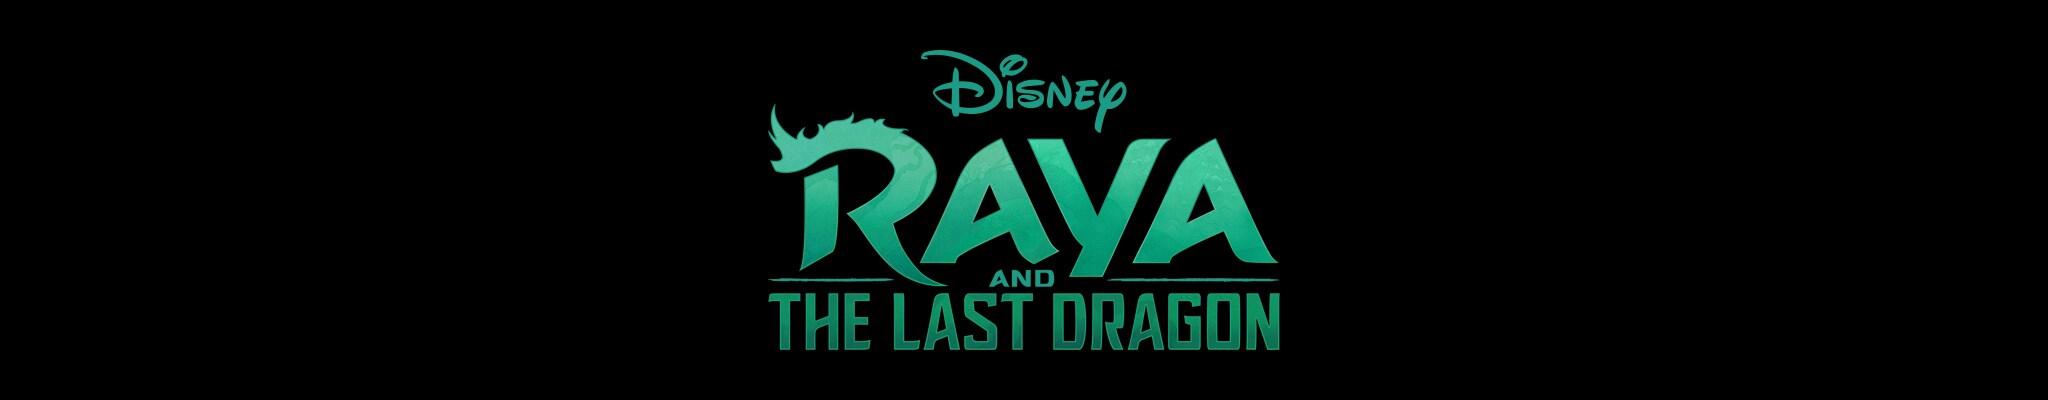 Disney | Raya and The Last Dragon